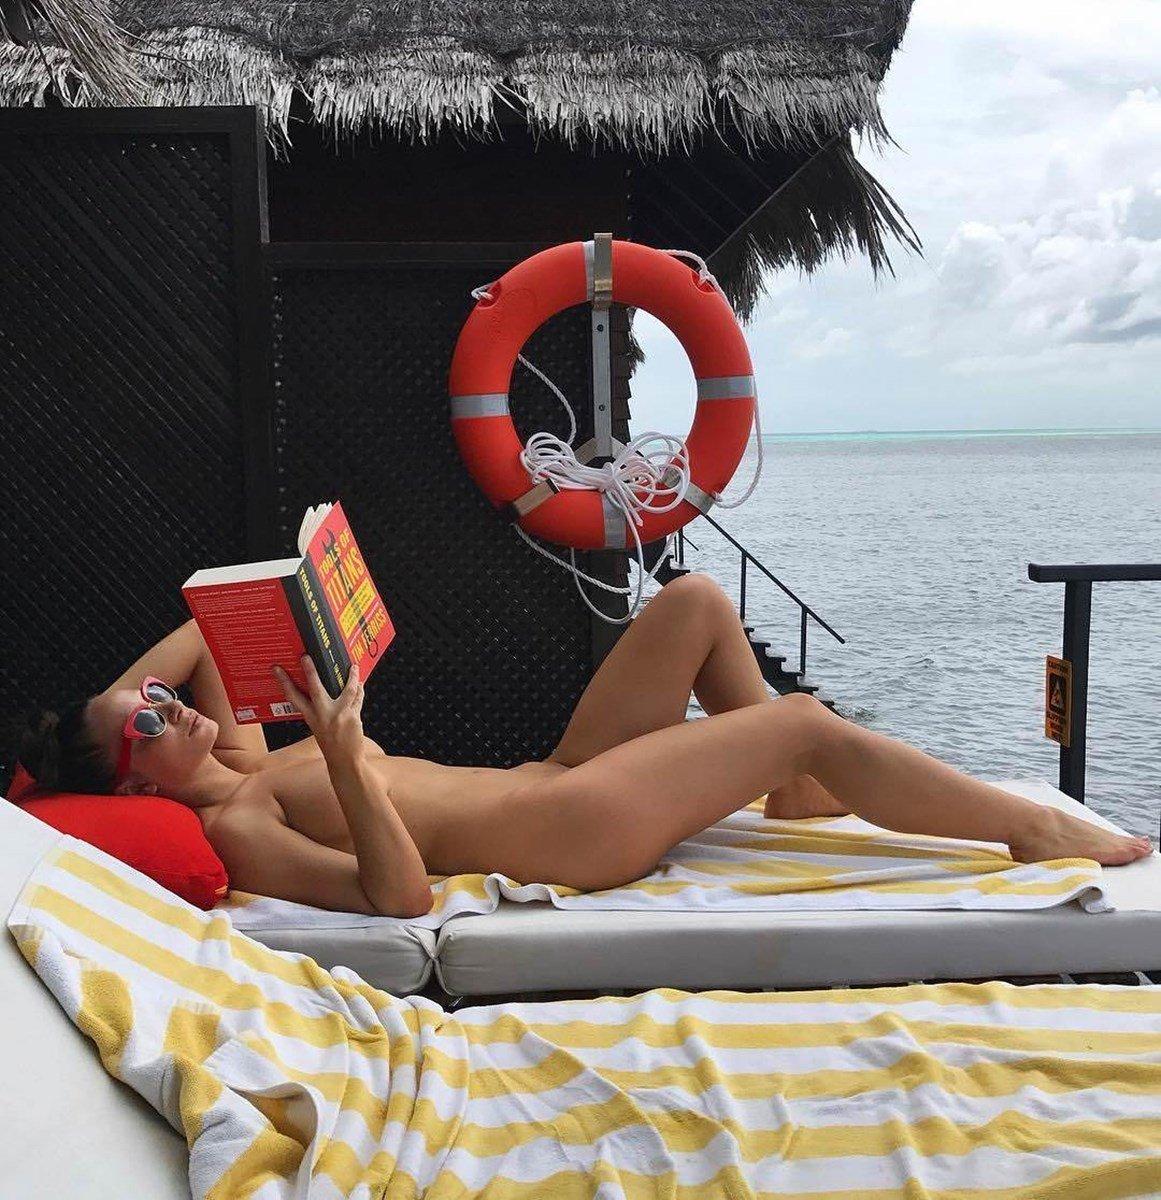 Rosie Roff Nude Photos Leaked